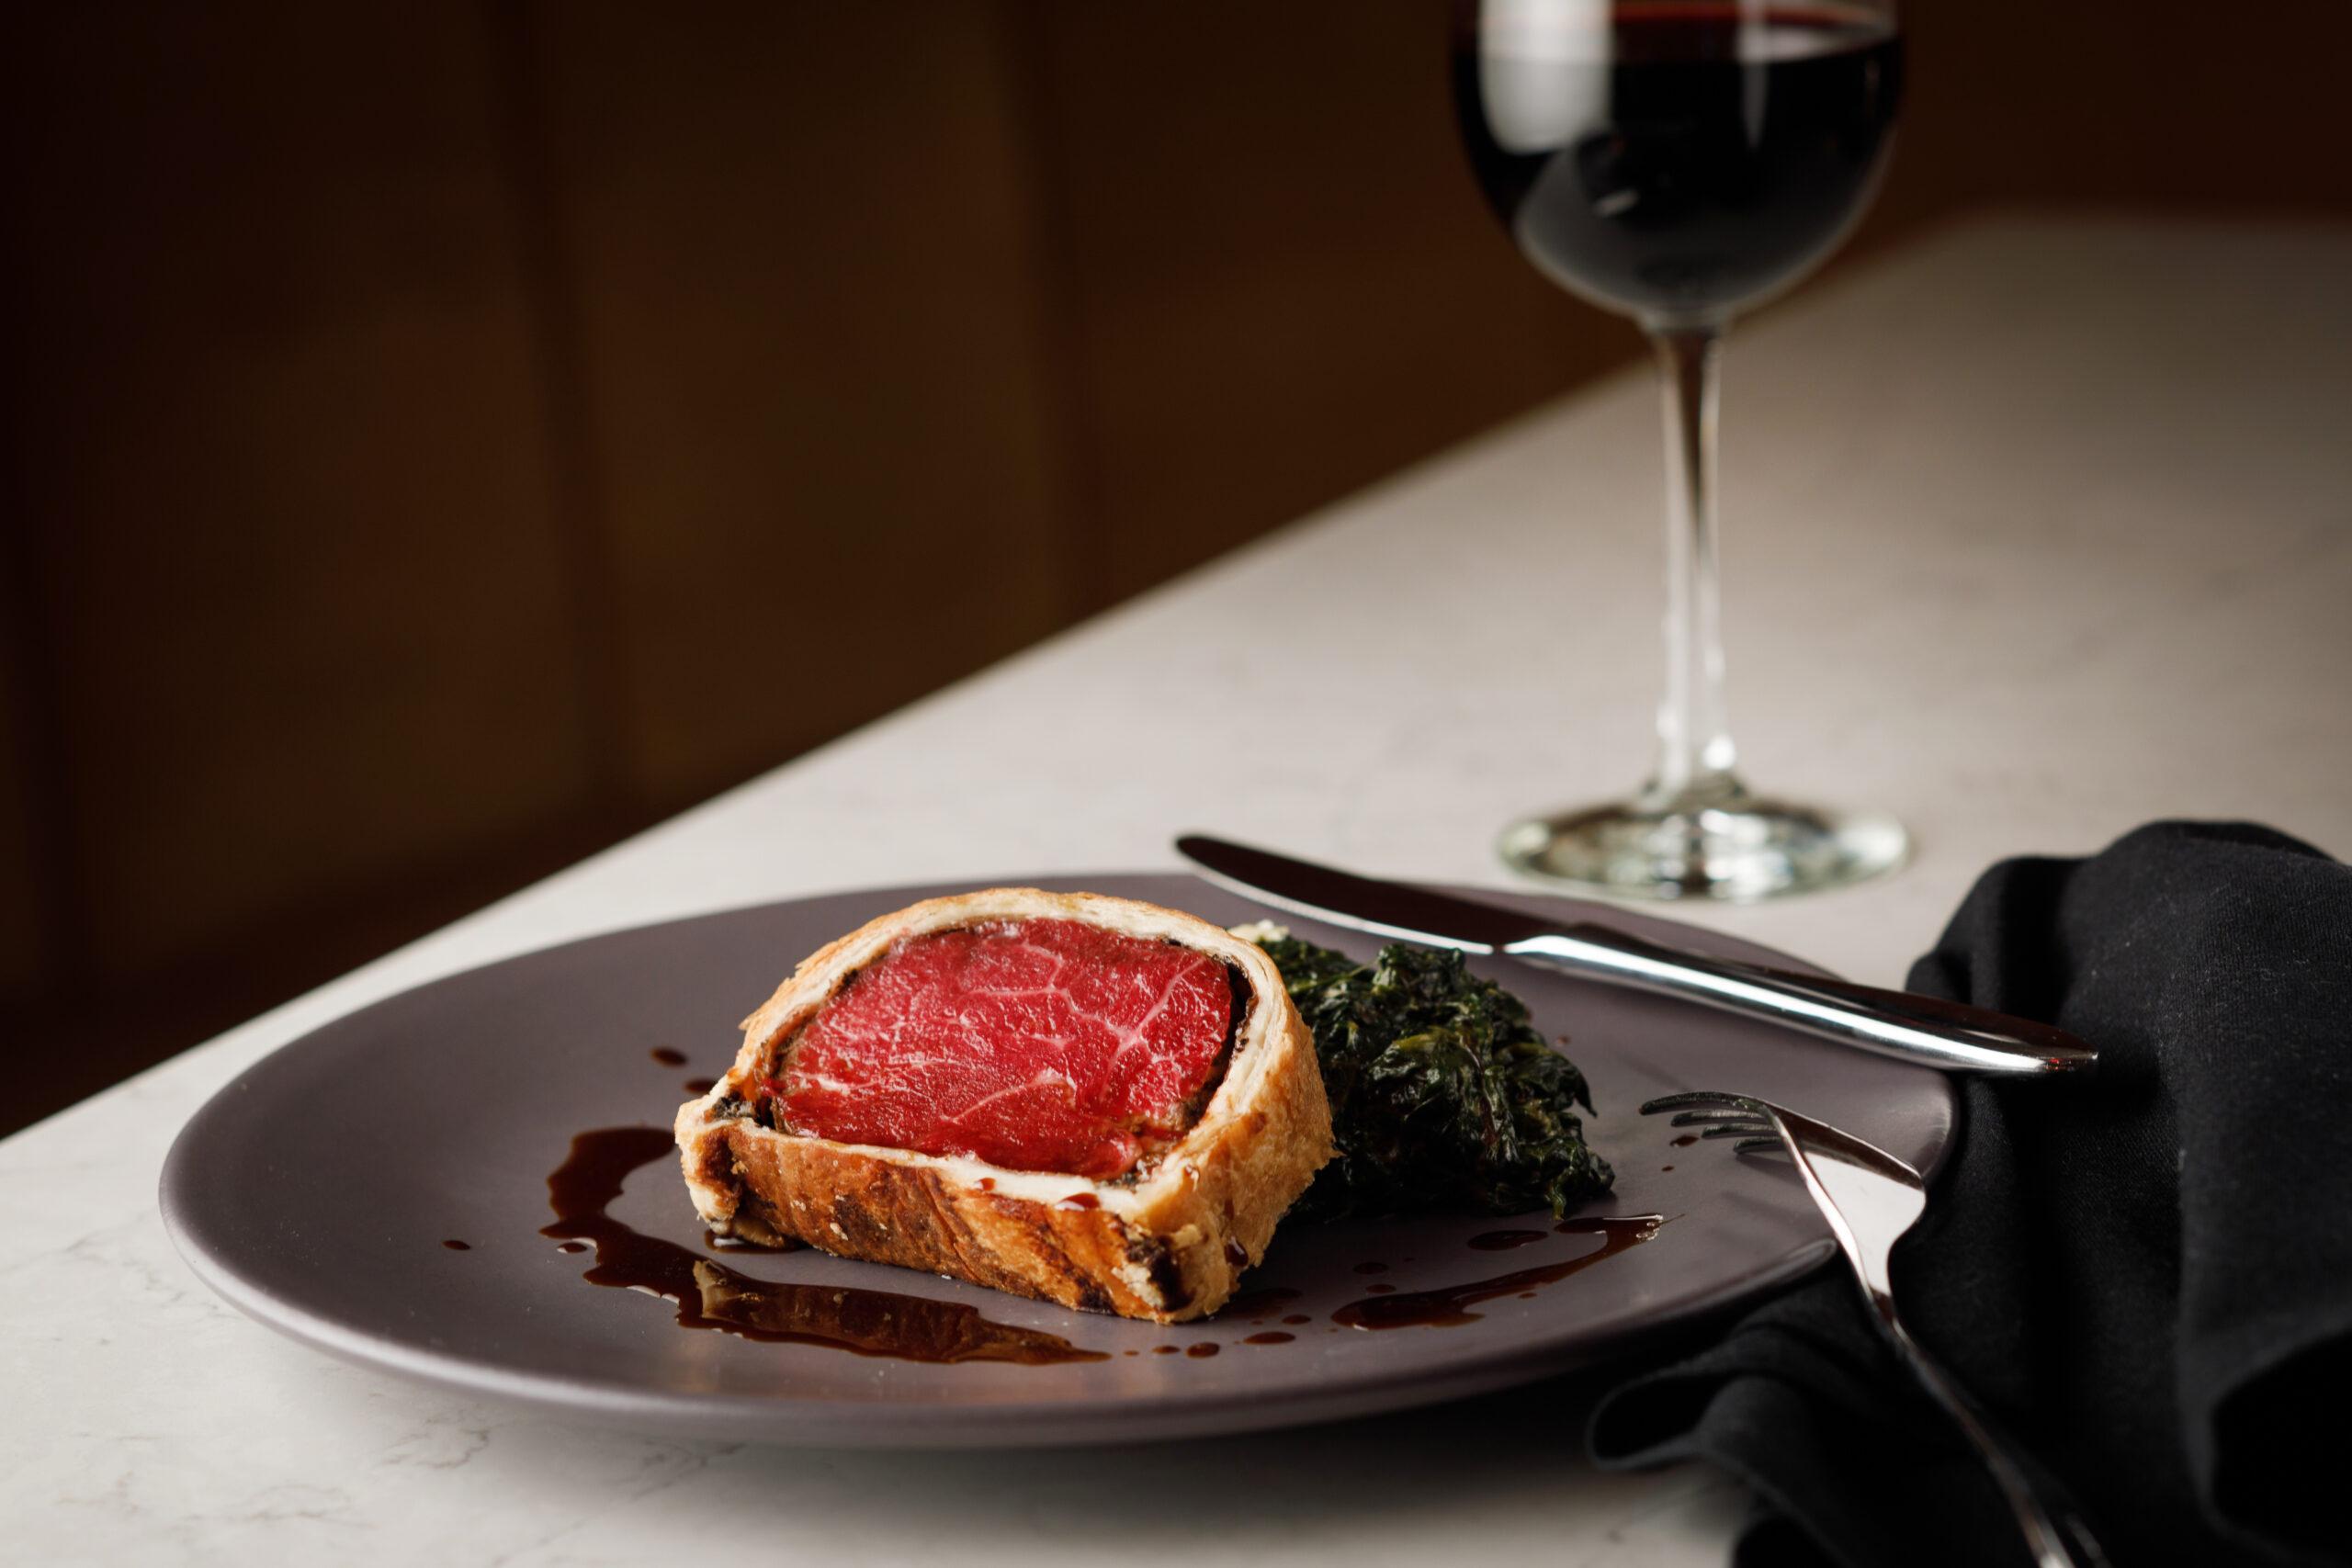 beef wellington on a grey plate beside a wine glass